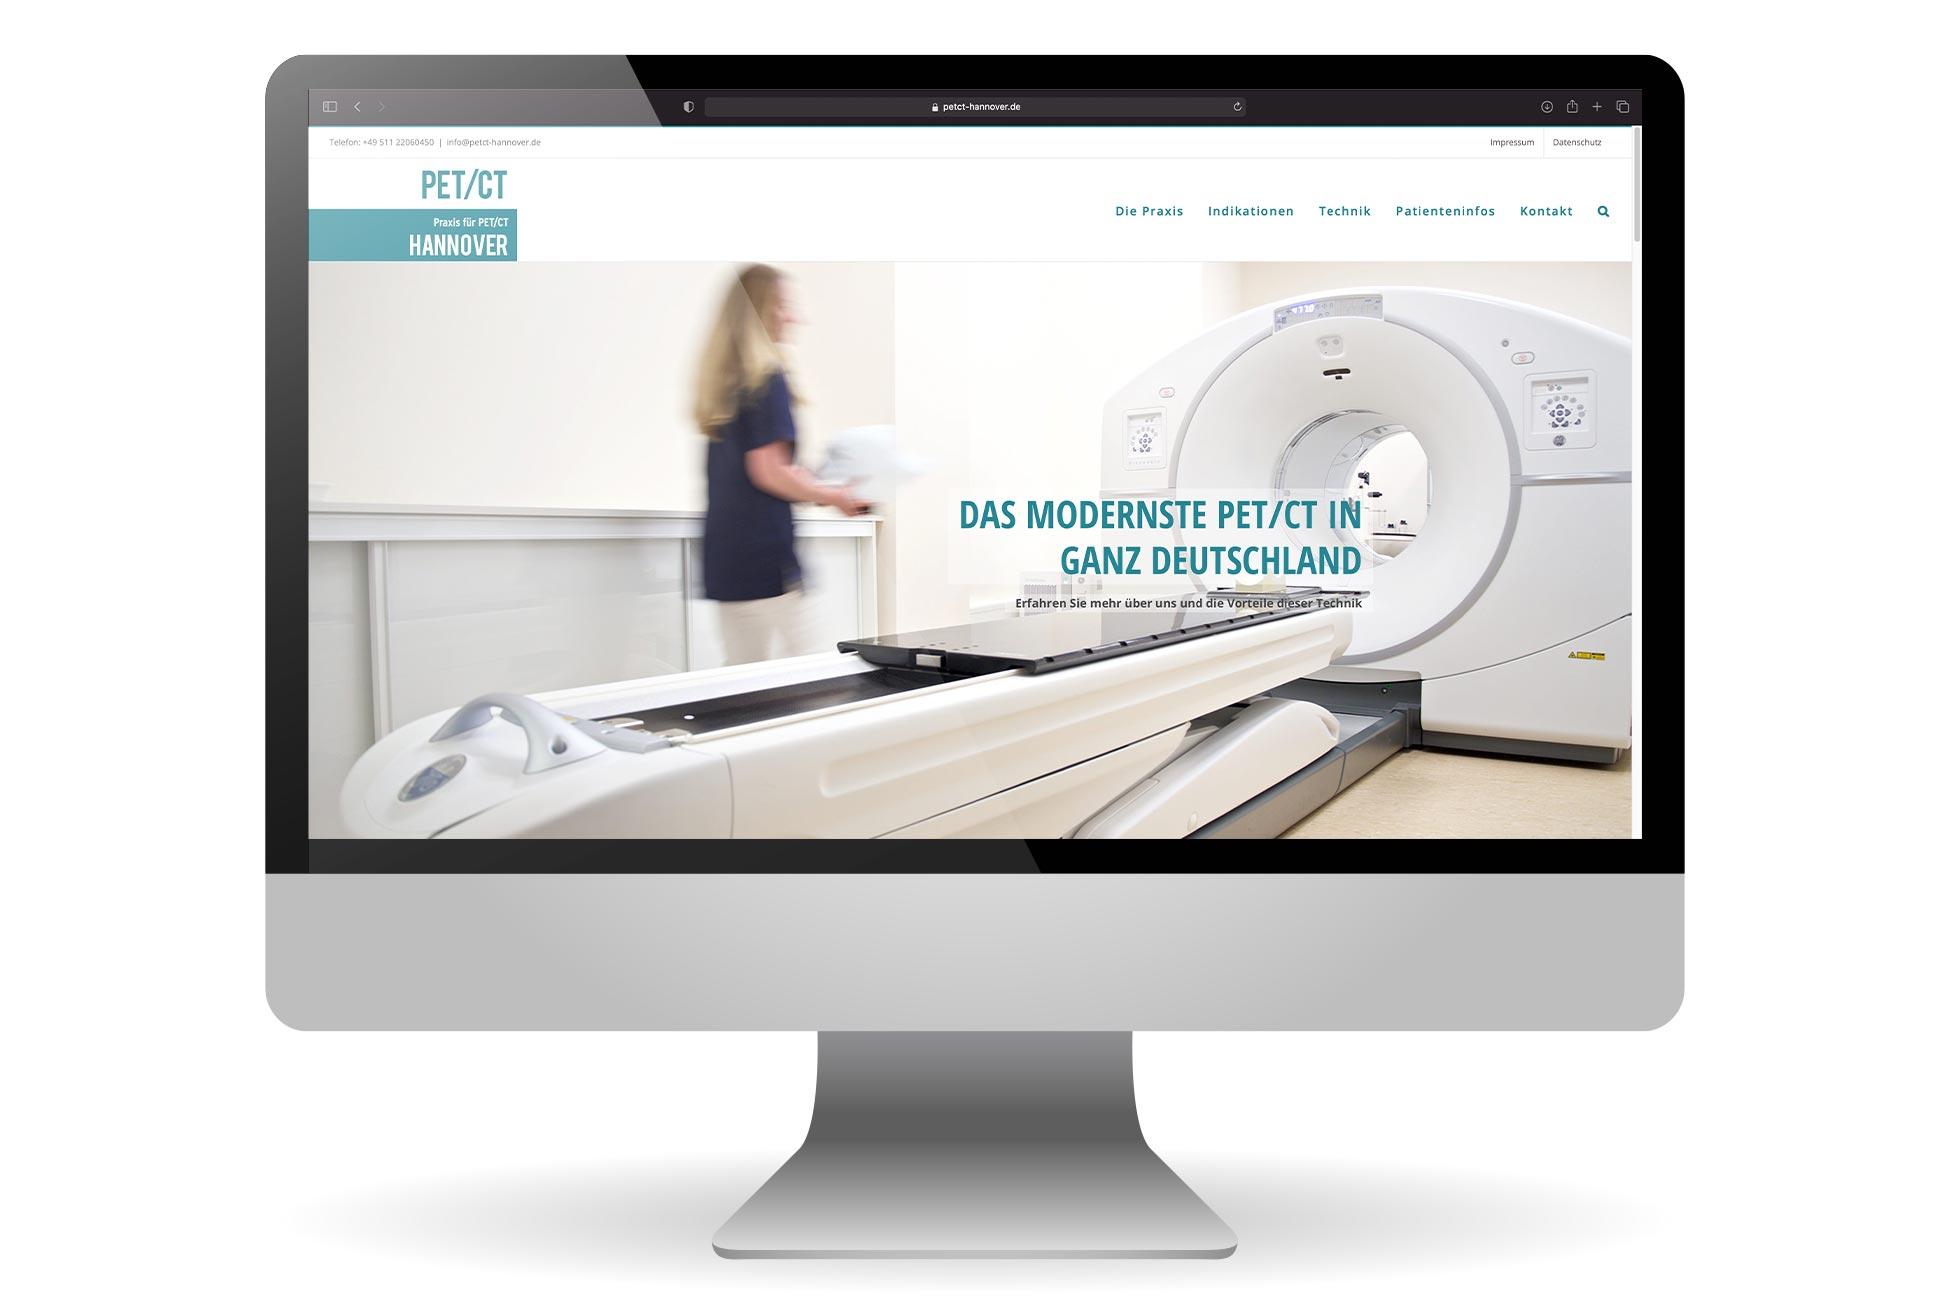 Praxis für PET/CT Hannover